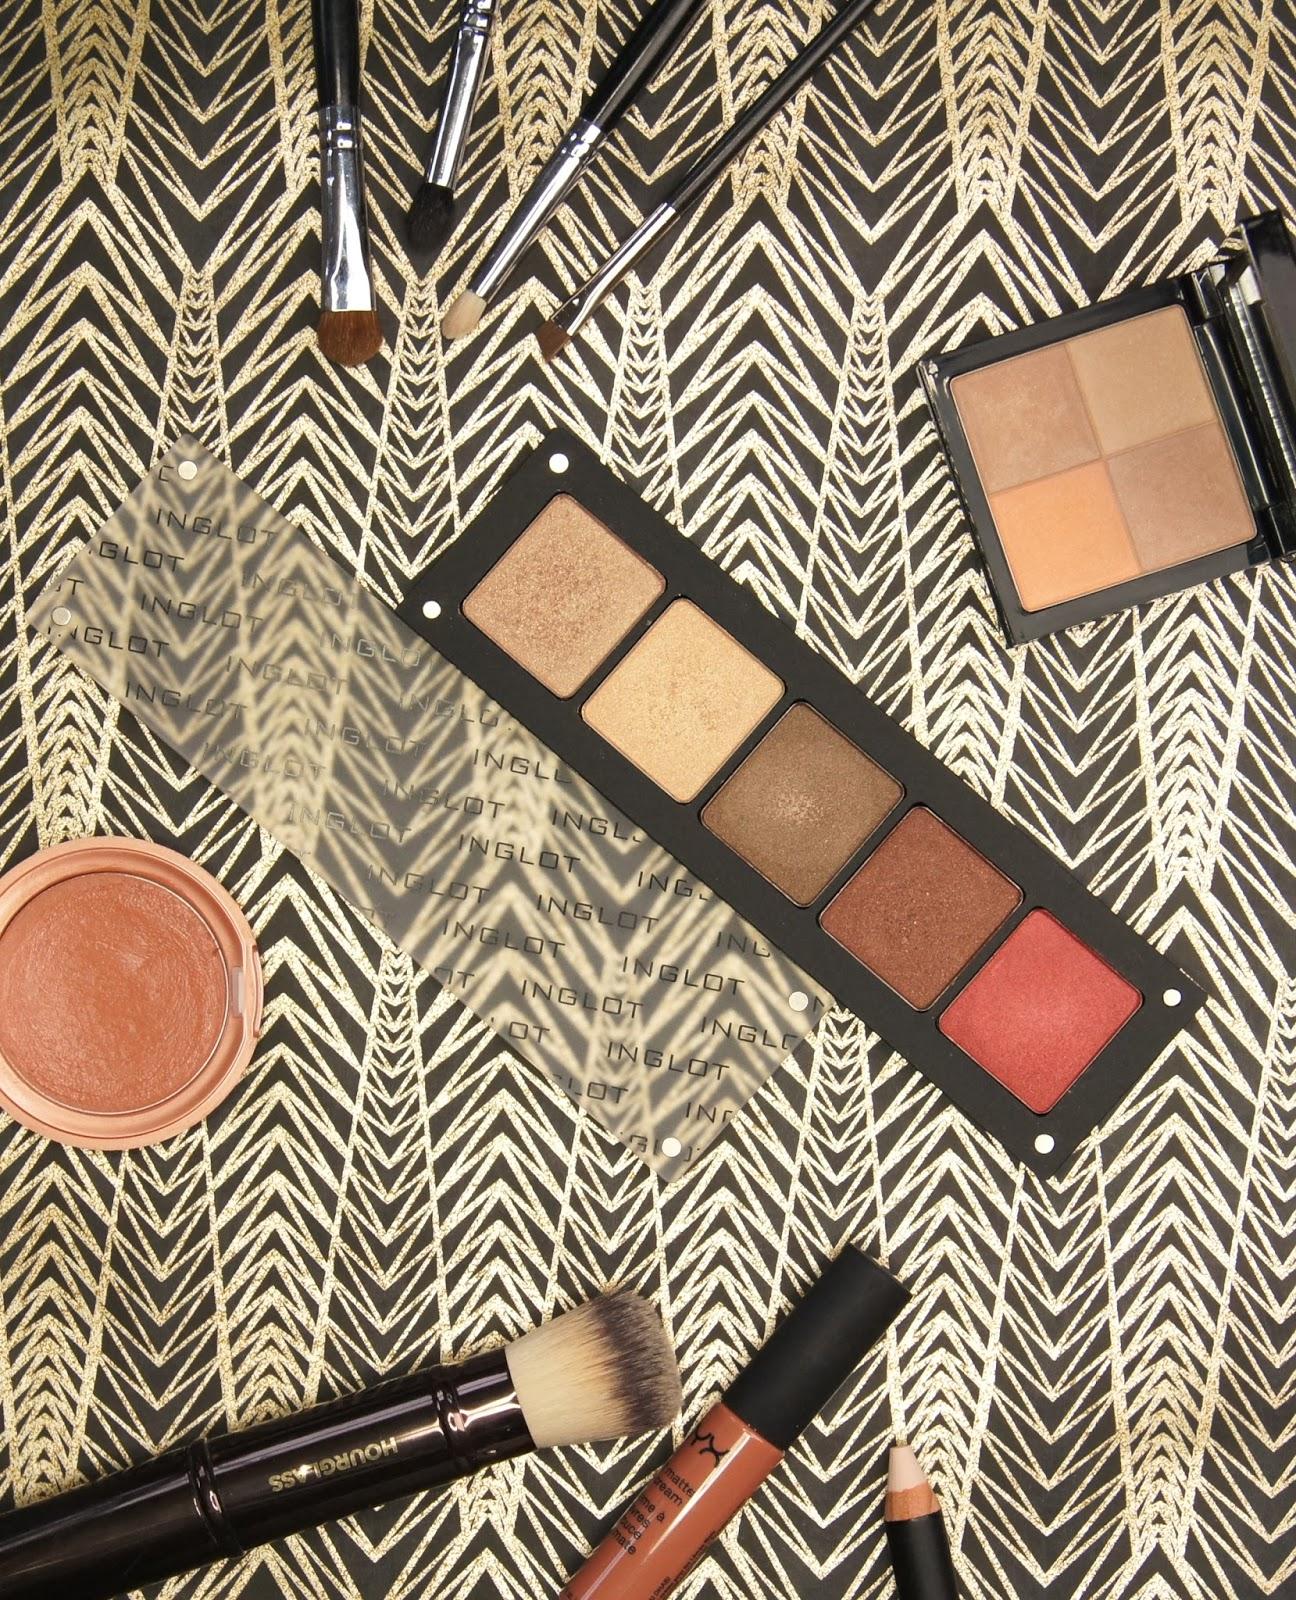 ingot freedom system custom eyeshadow palette review shades 07 11 421 422 607 mac comparison